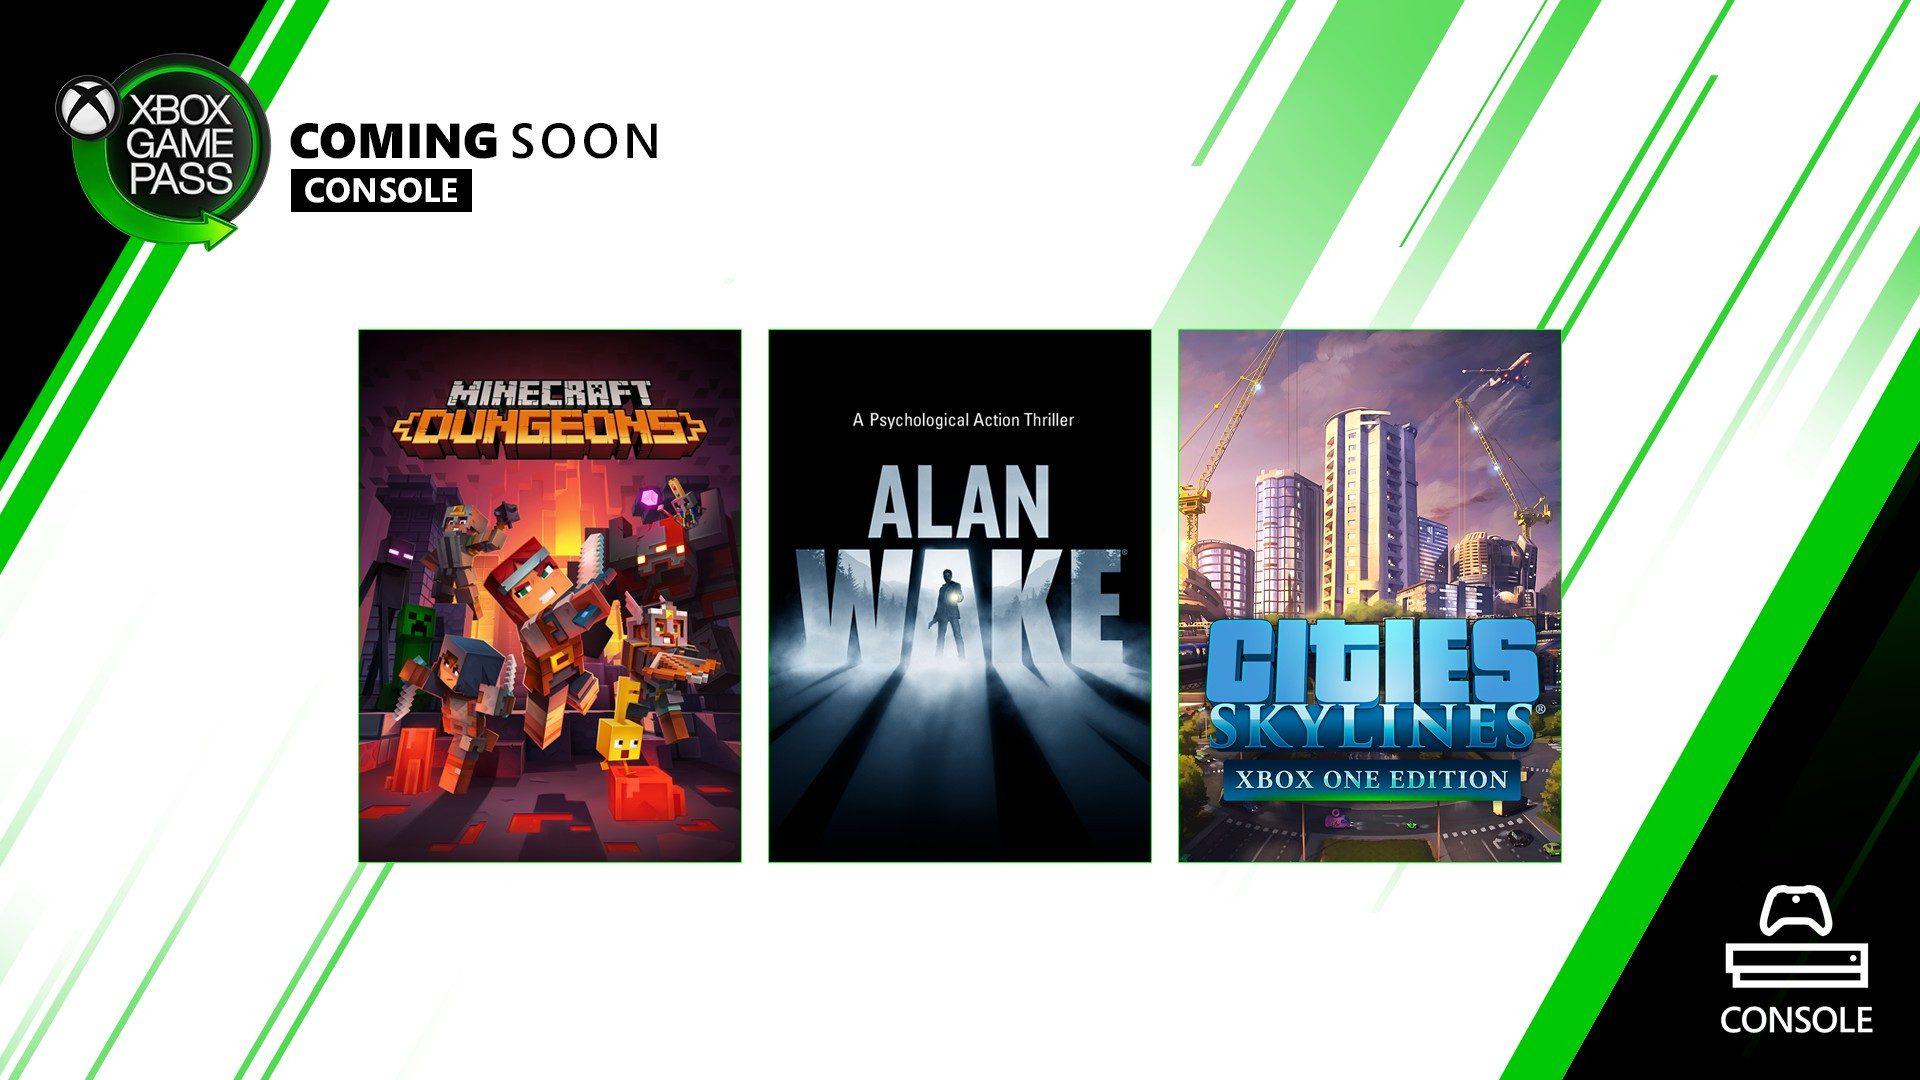 Em breve no Xbox Game Pass para Console: Alan Wake, Cities: Skylines e Minecraft Dungeons